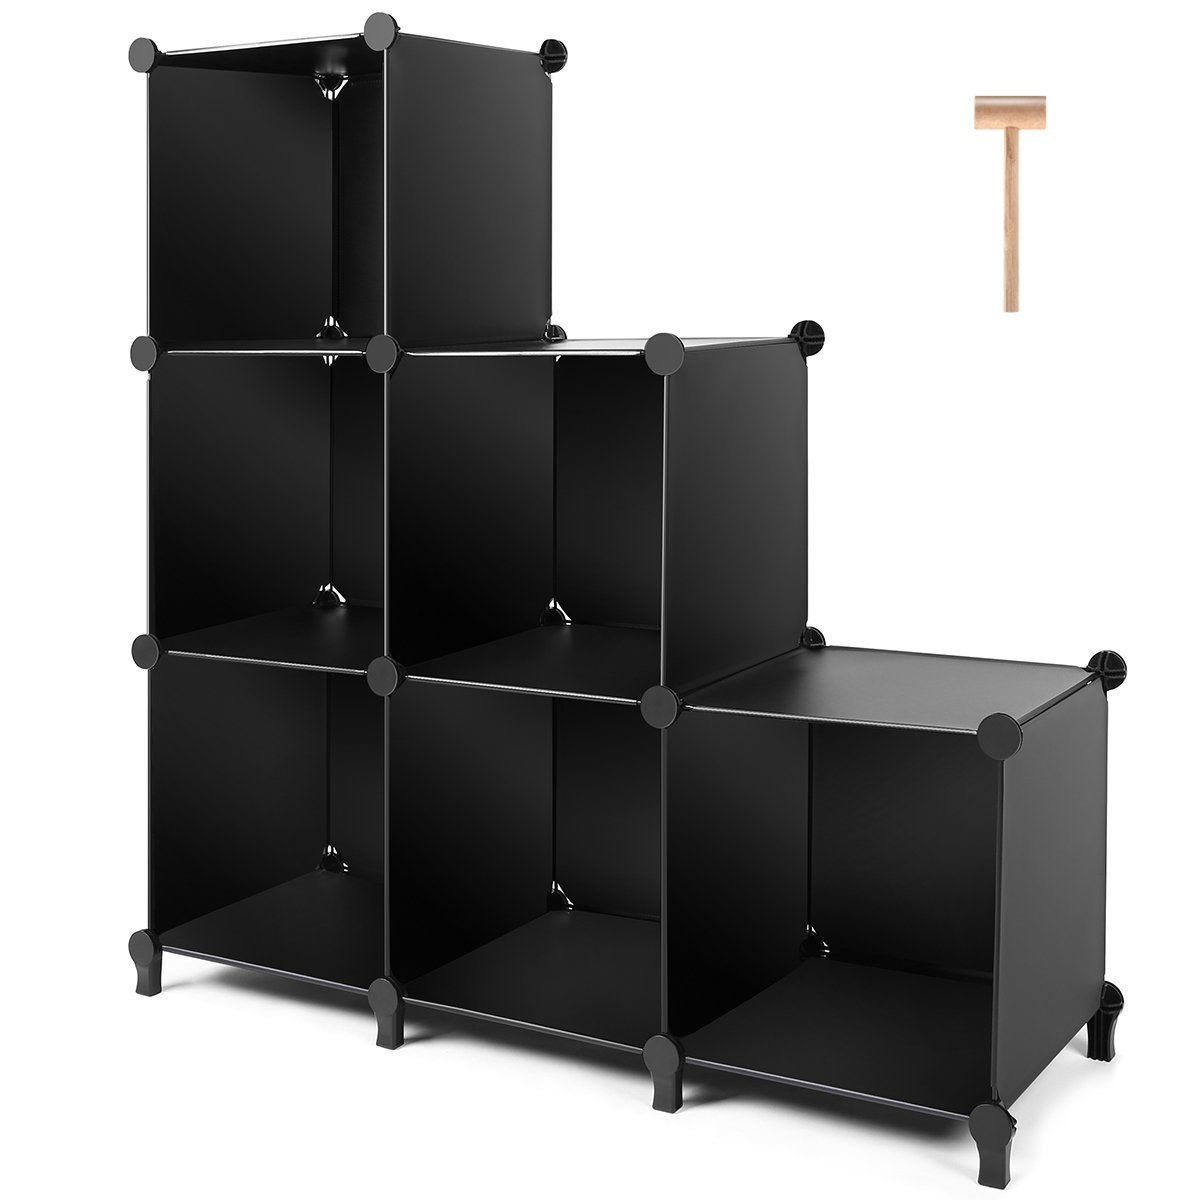 Cube Closet Organizer Storage Shelves